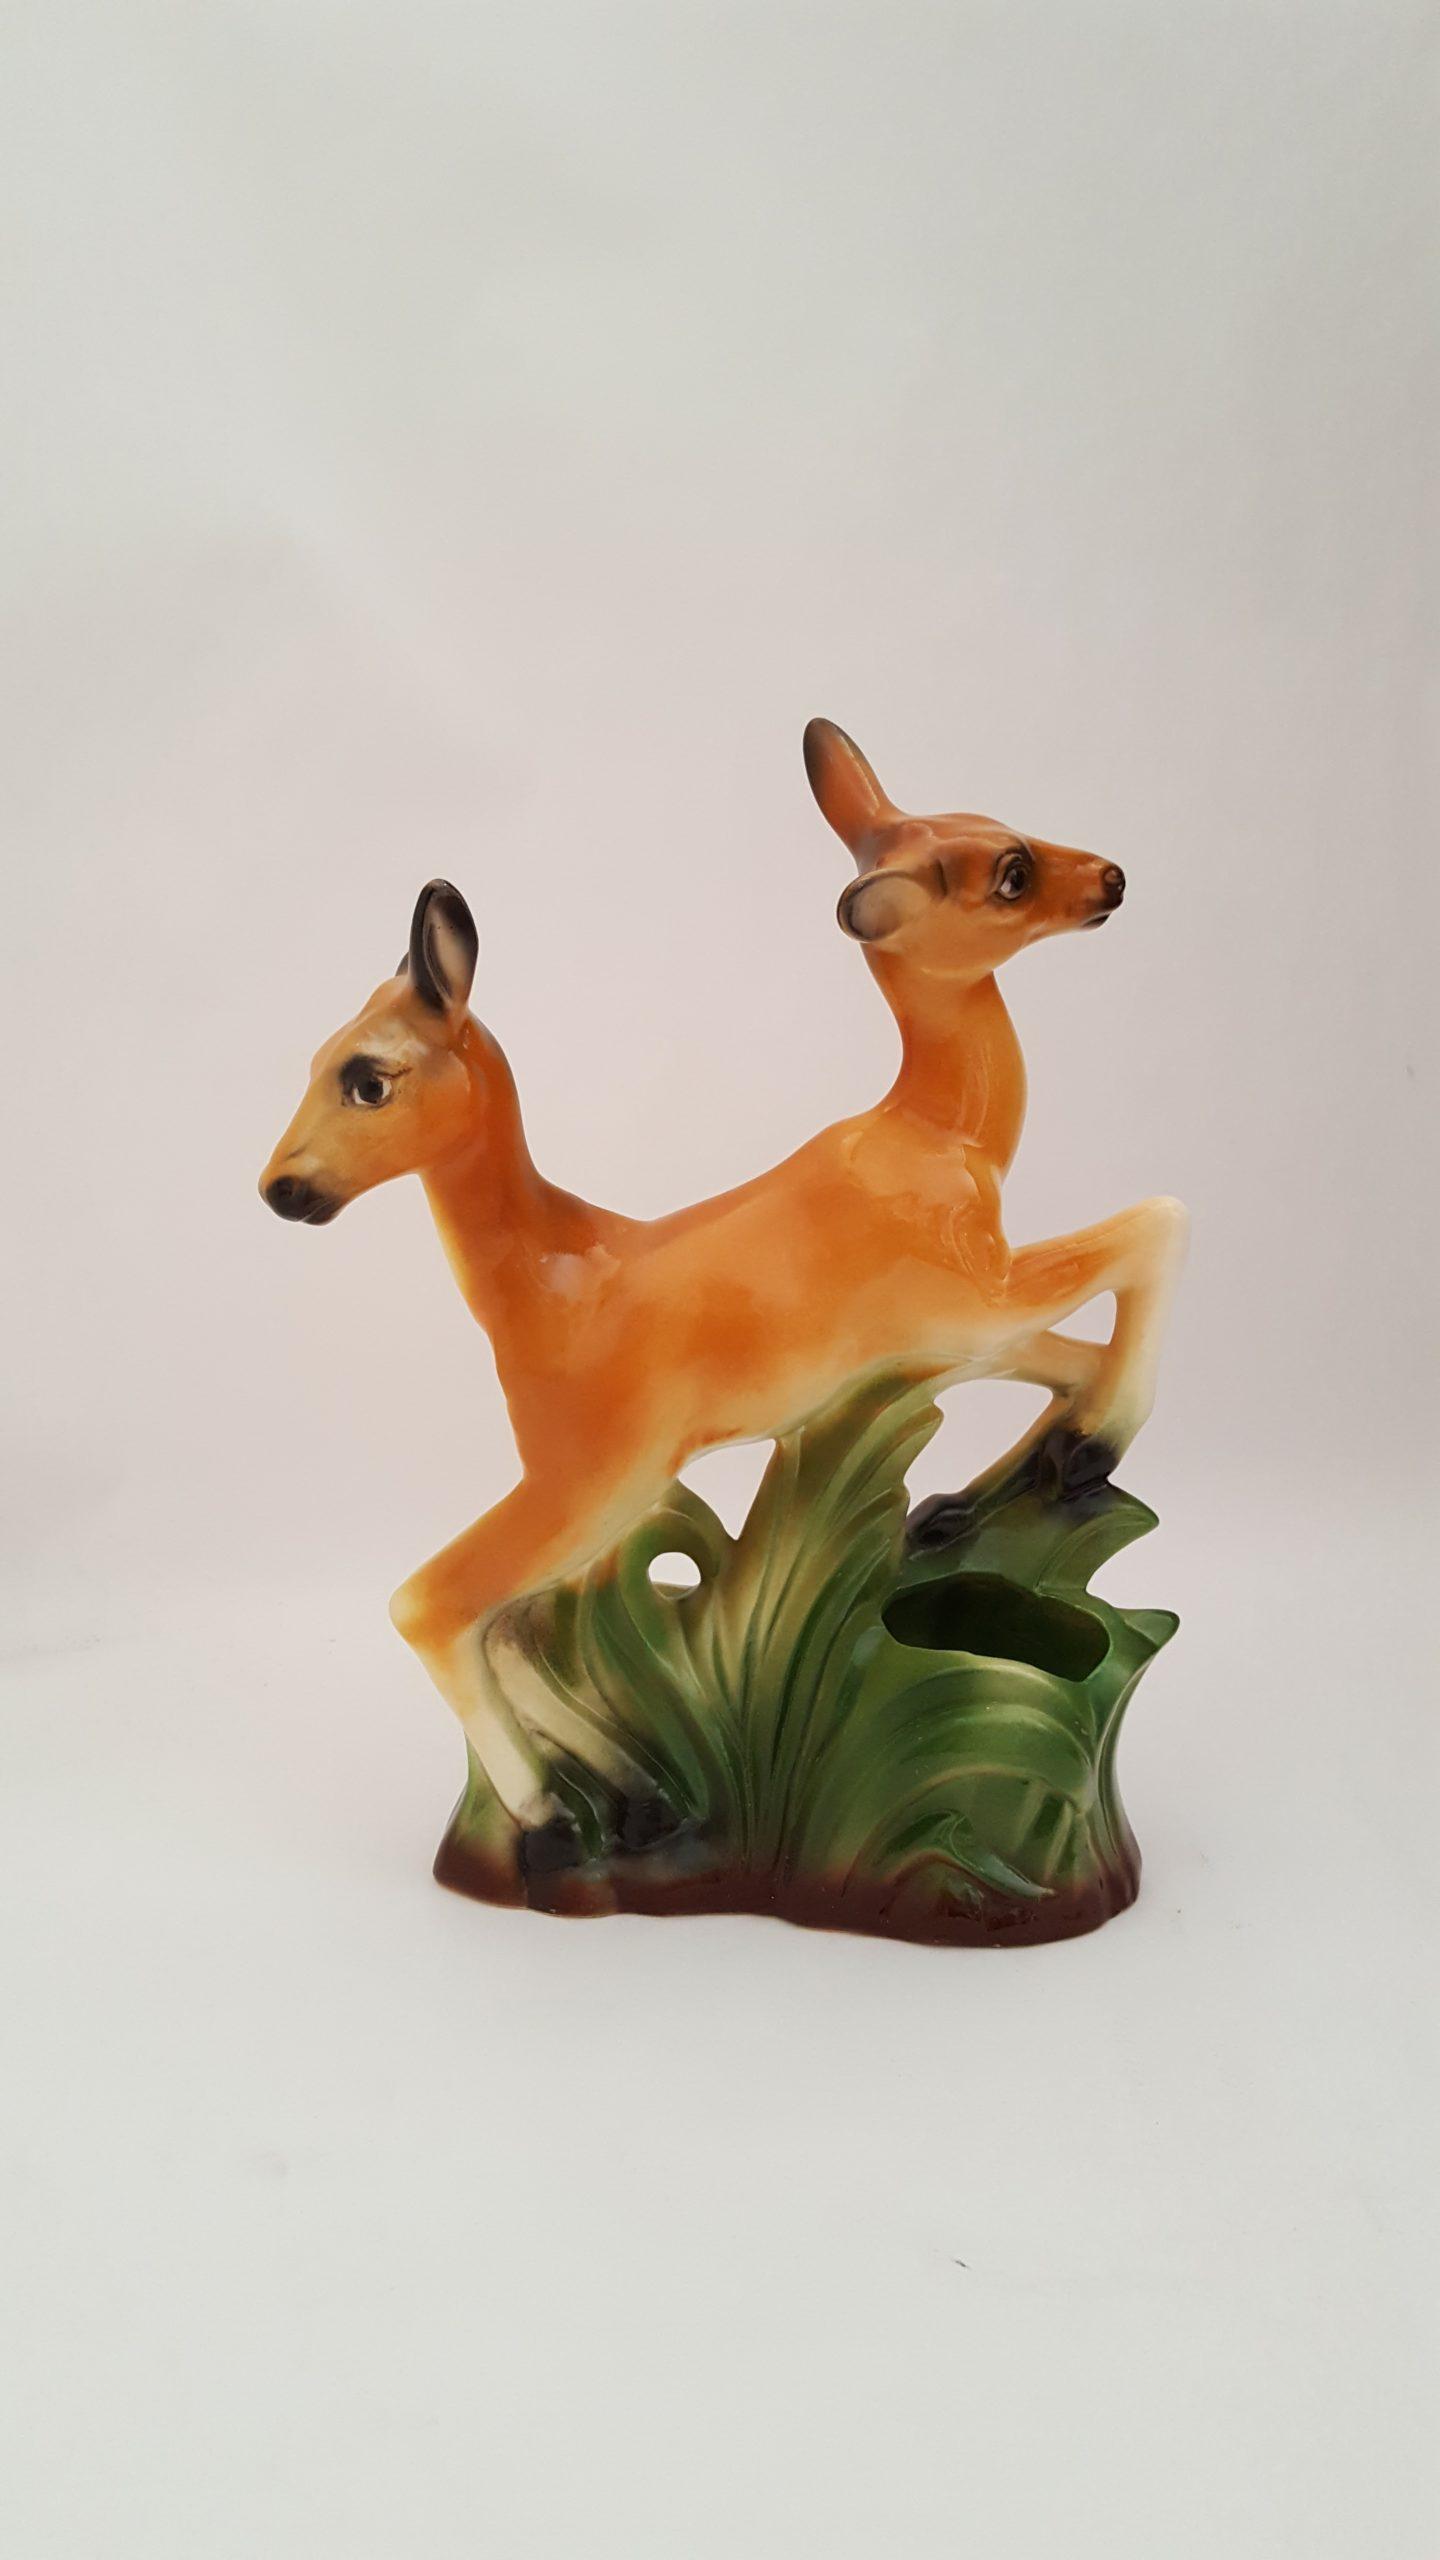 "Debra Broz, Double Deer, 2020 Mixed media on secondhand ceramic figurines 10"" x 8"" x 3"""